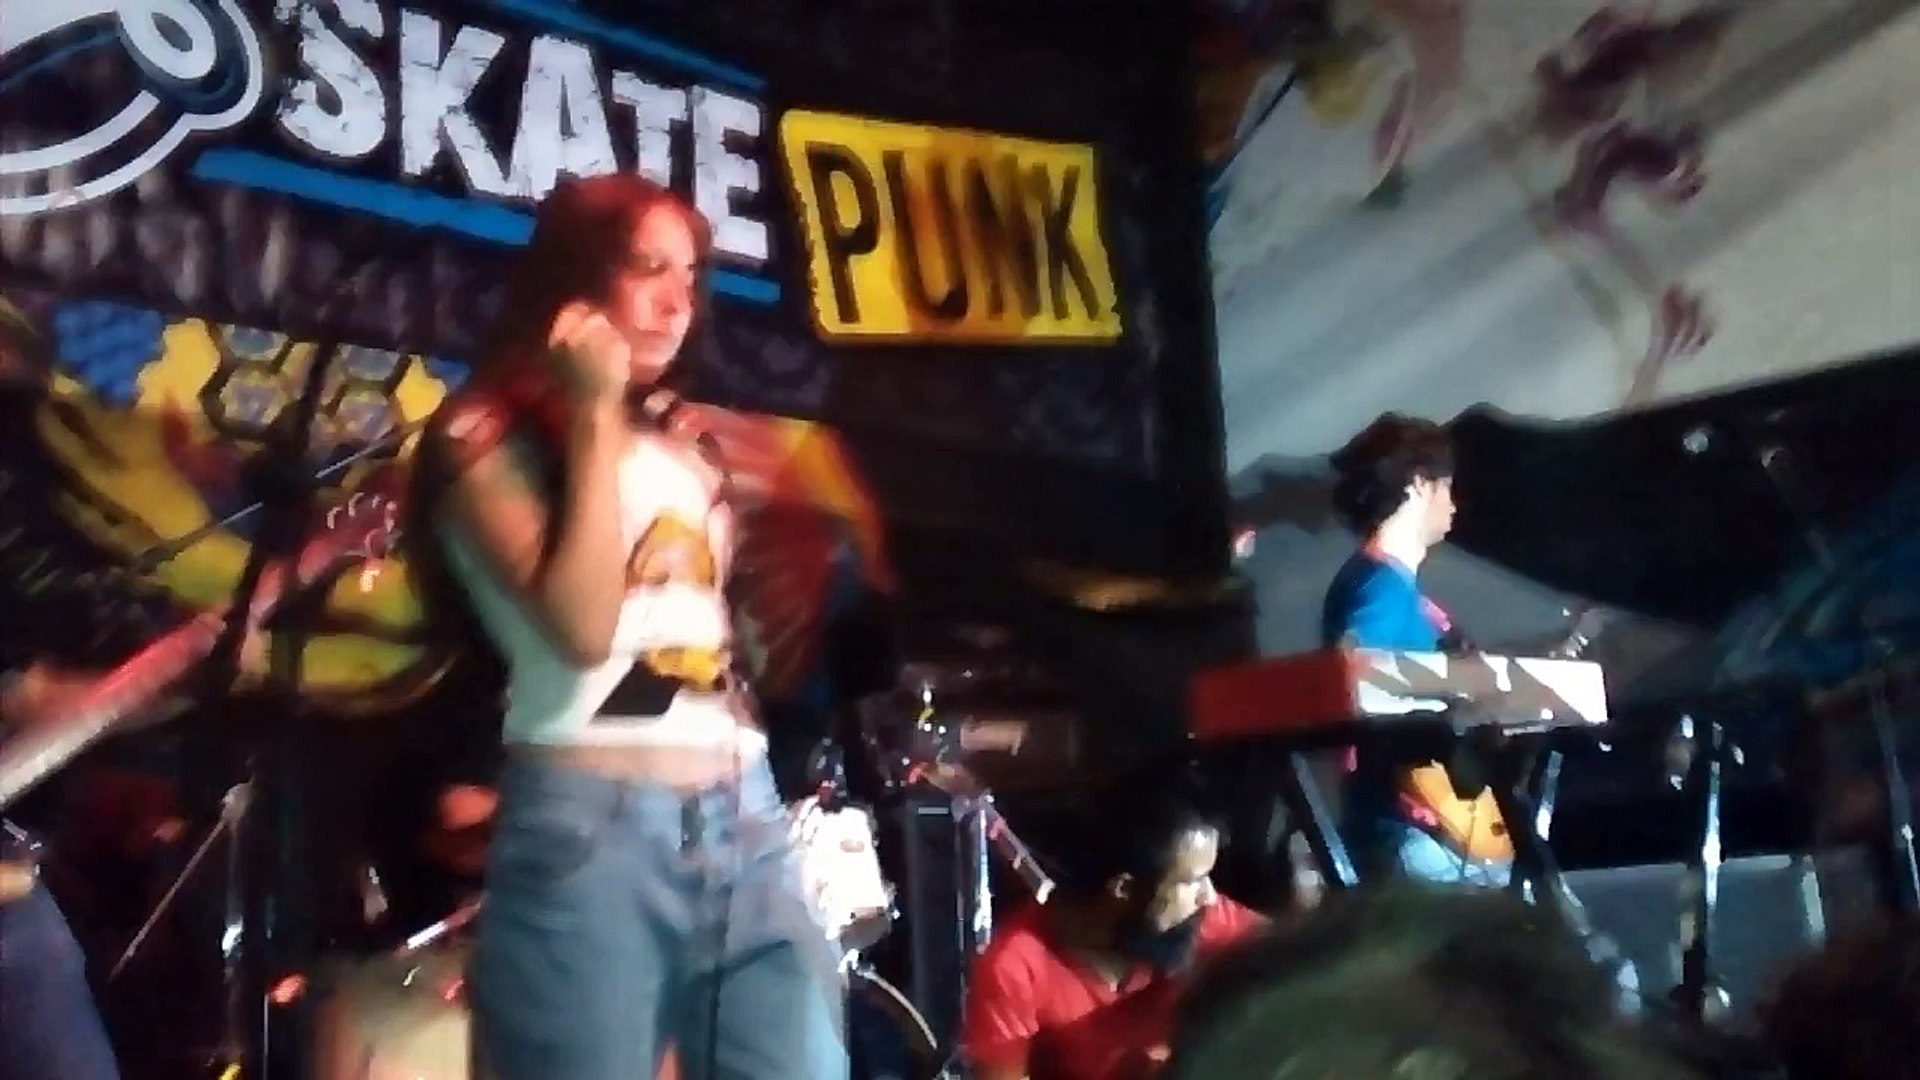 Odio a Botero - Orland Under Attack (Skate Punk Festival - 20-09-2014)